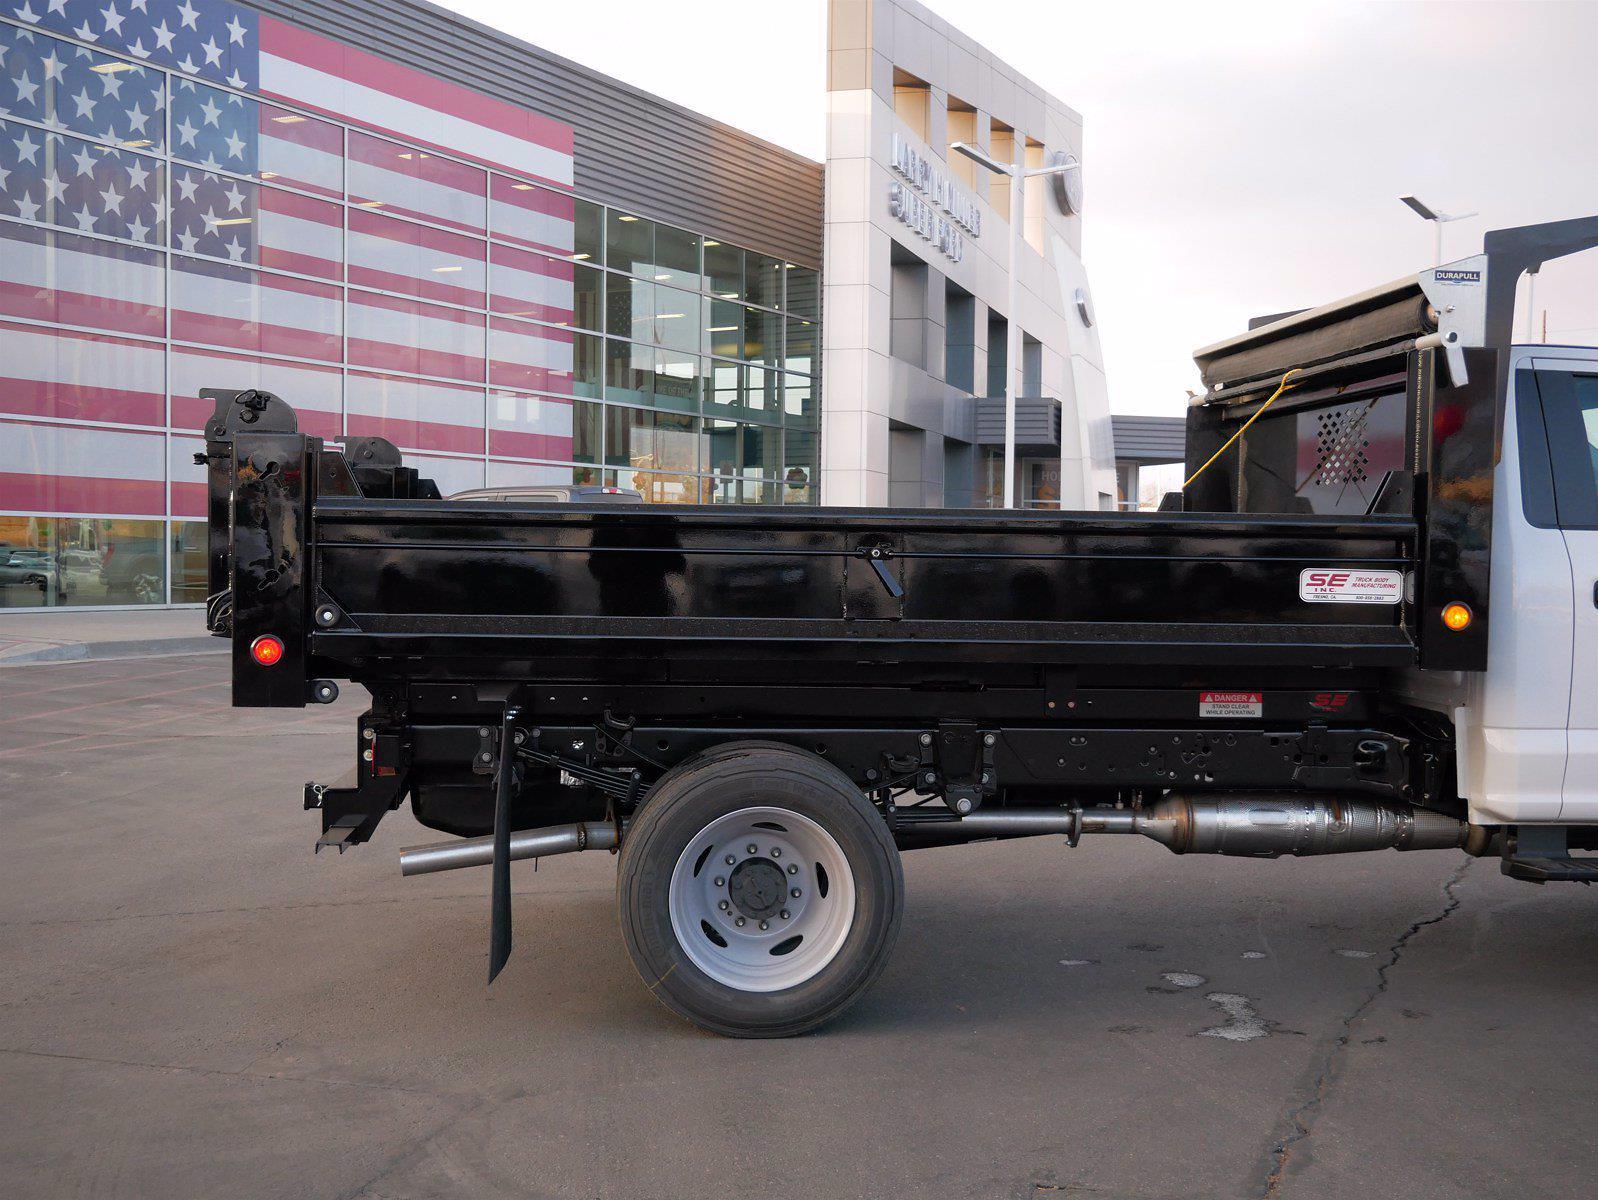 2020 Ford F-550 Regular Cab DRW 4x4, Scelzi Dump Body #63233 - photo 10